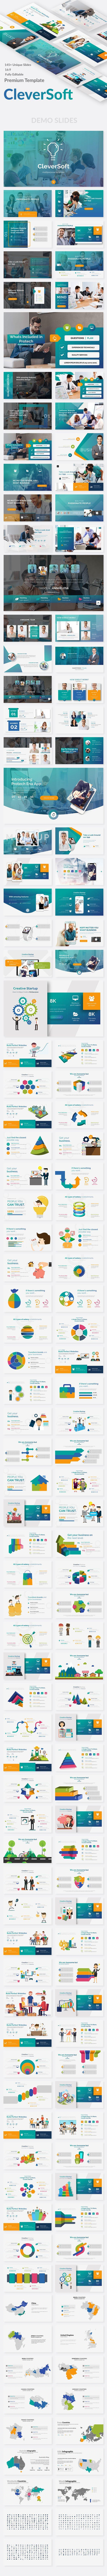 CleverSoft Multipurpose and Business Google Slide Template - Google Slides Presentation Templates